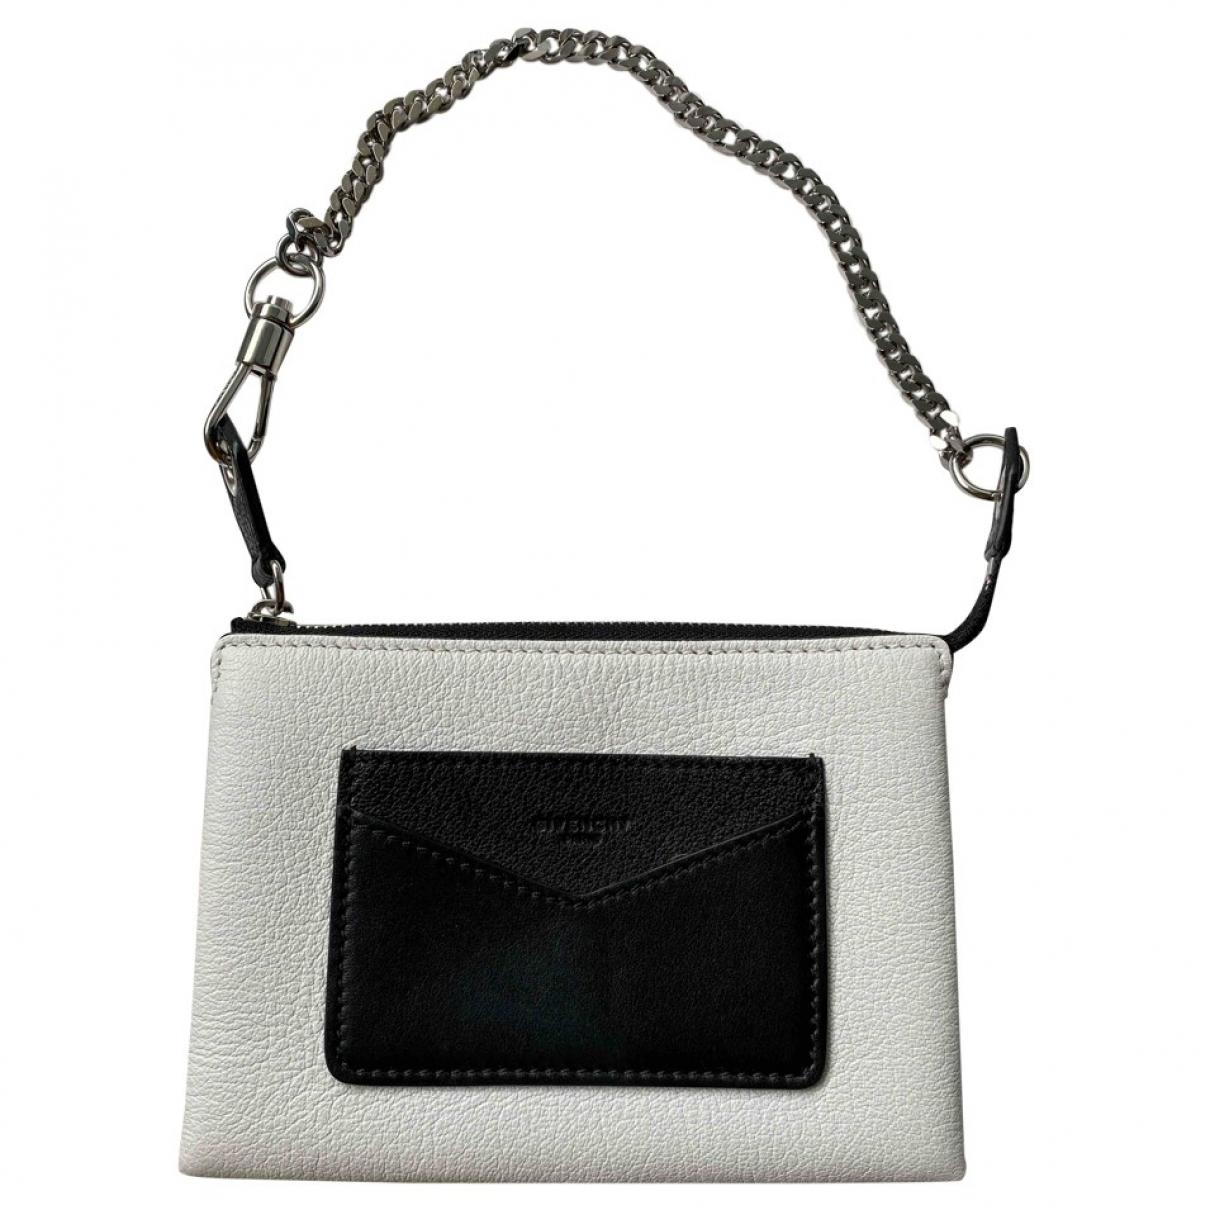 Givenchy \N Handtasche in  Weiss Leder